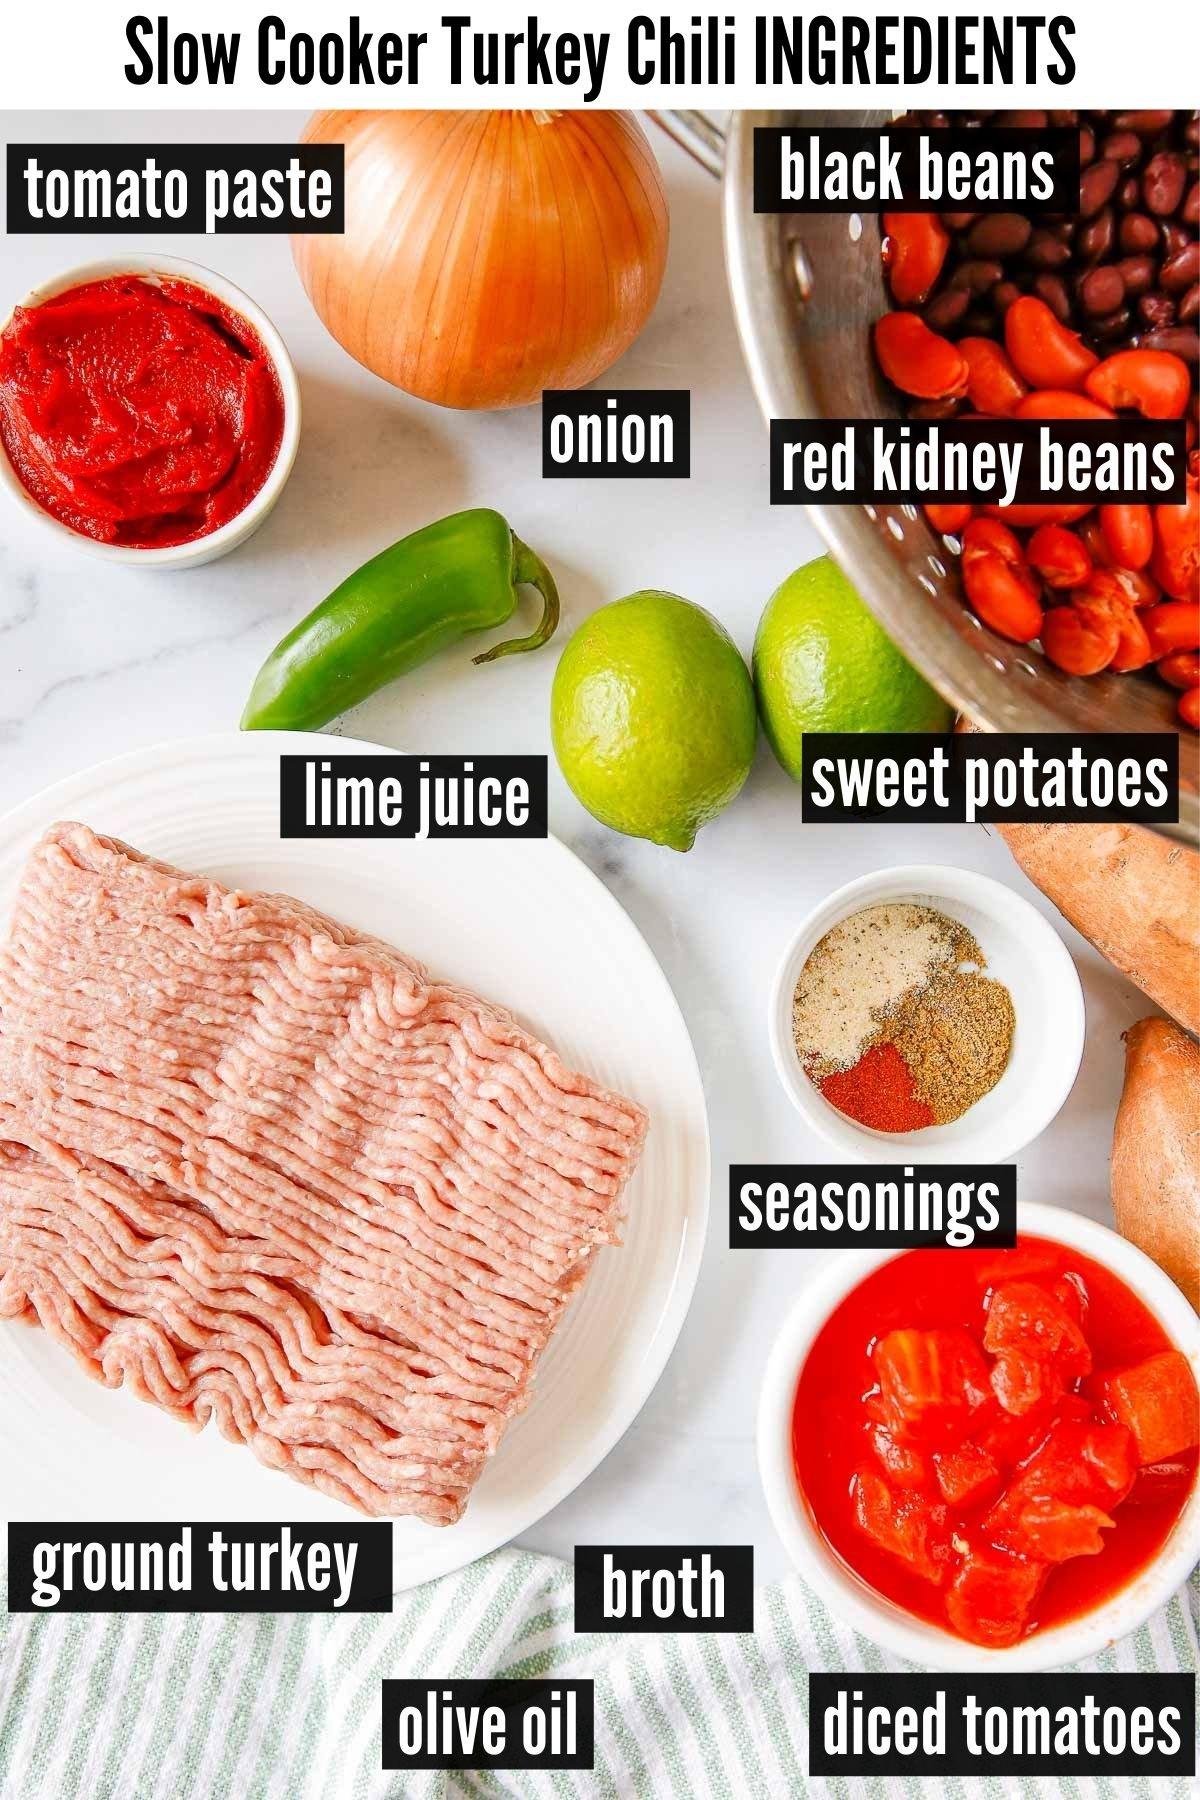 slow cooker turkey chili ingredients